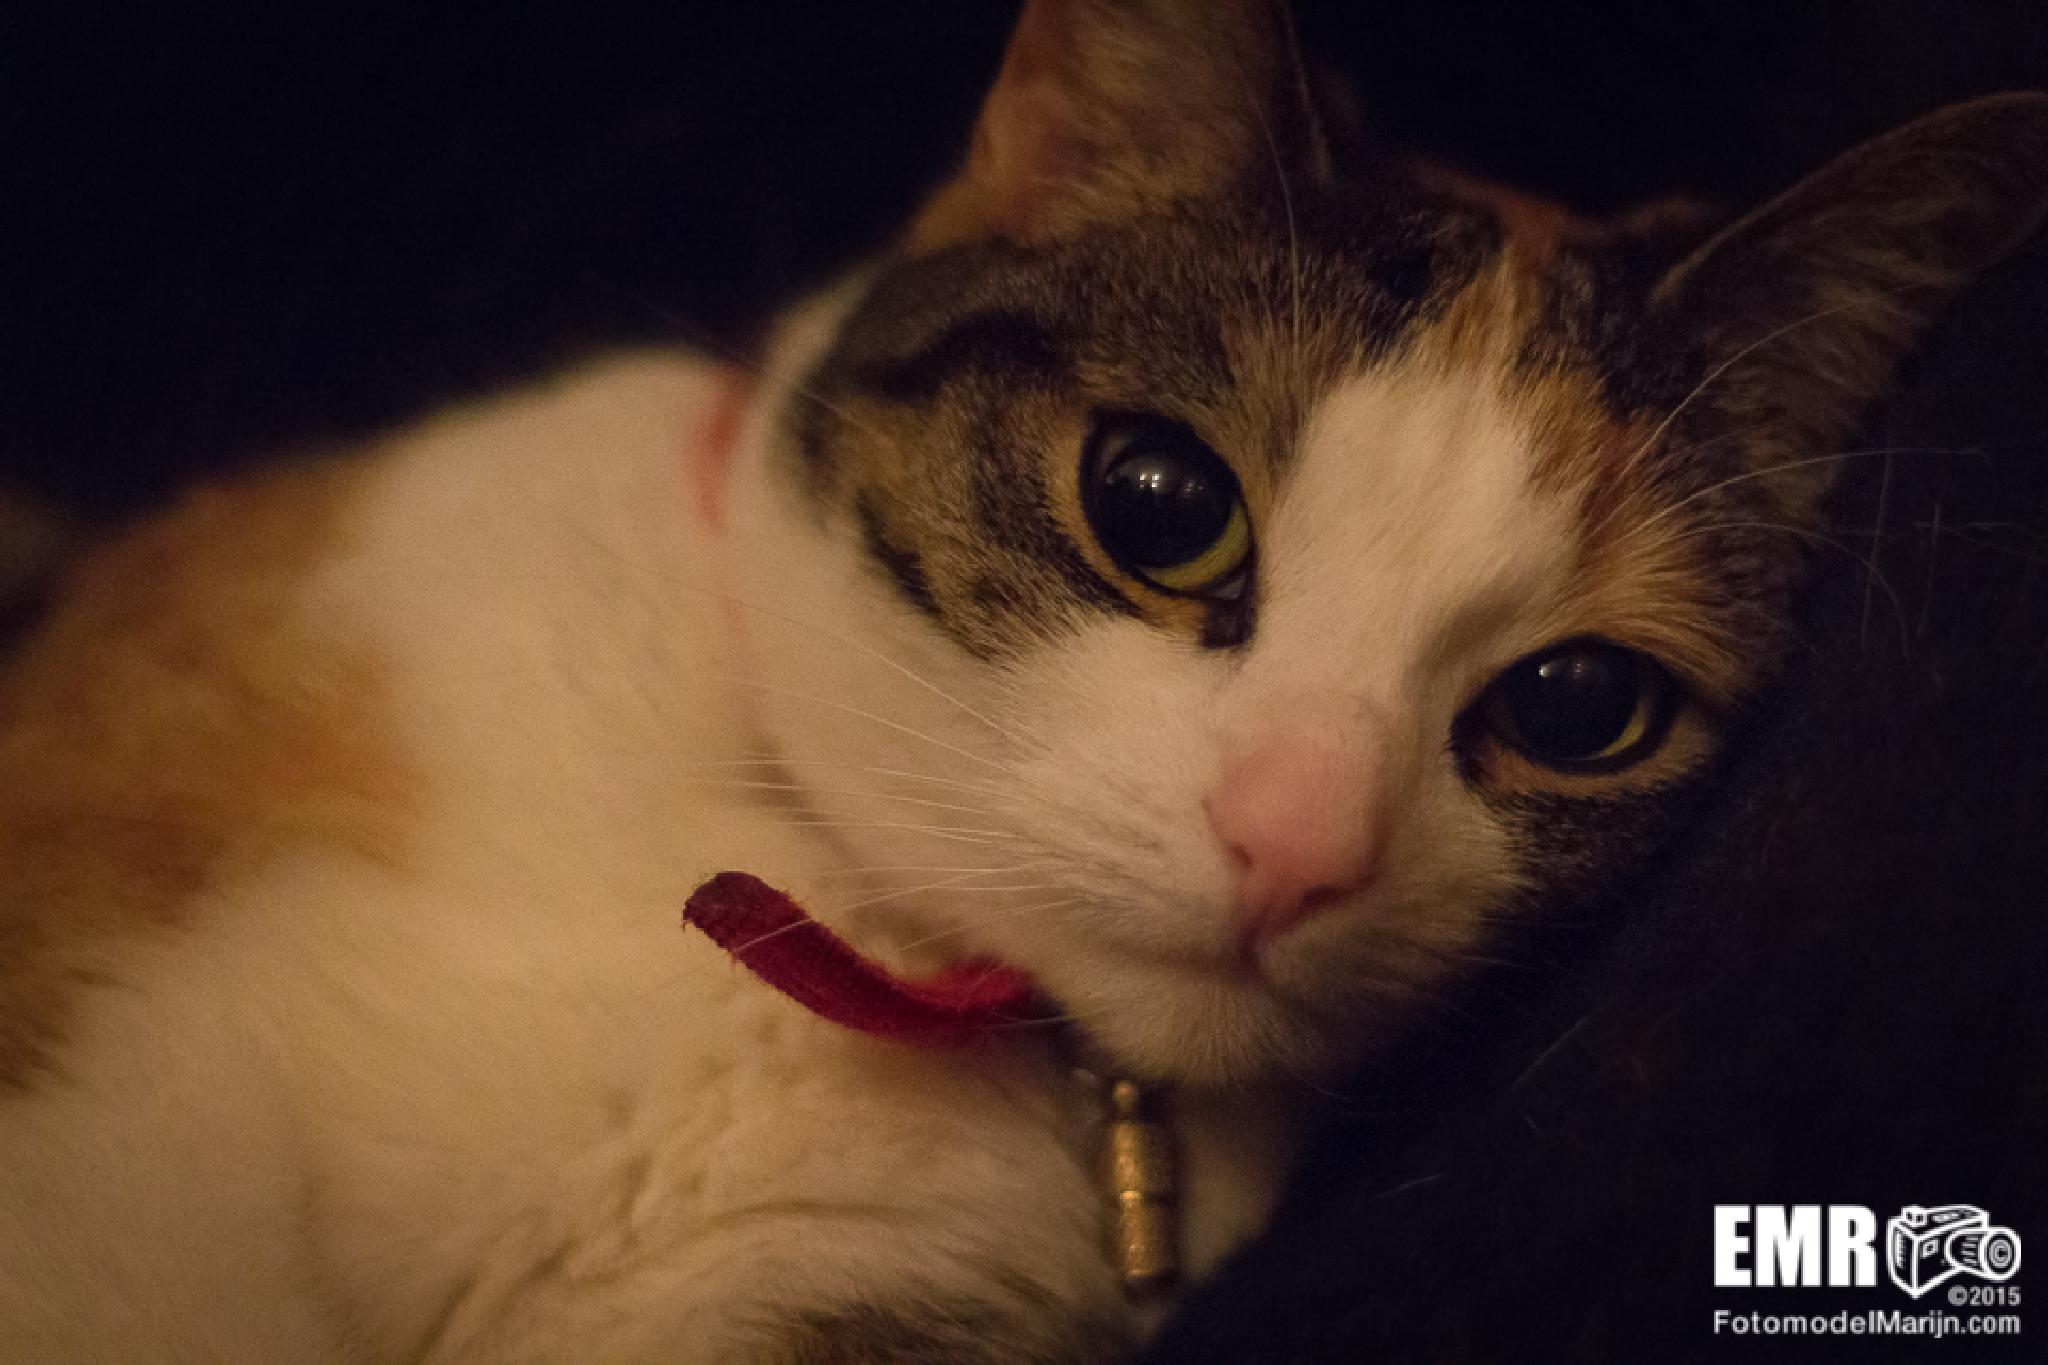 Cat by EMR Photography & Fotomodel Marijn